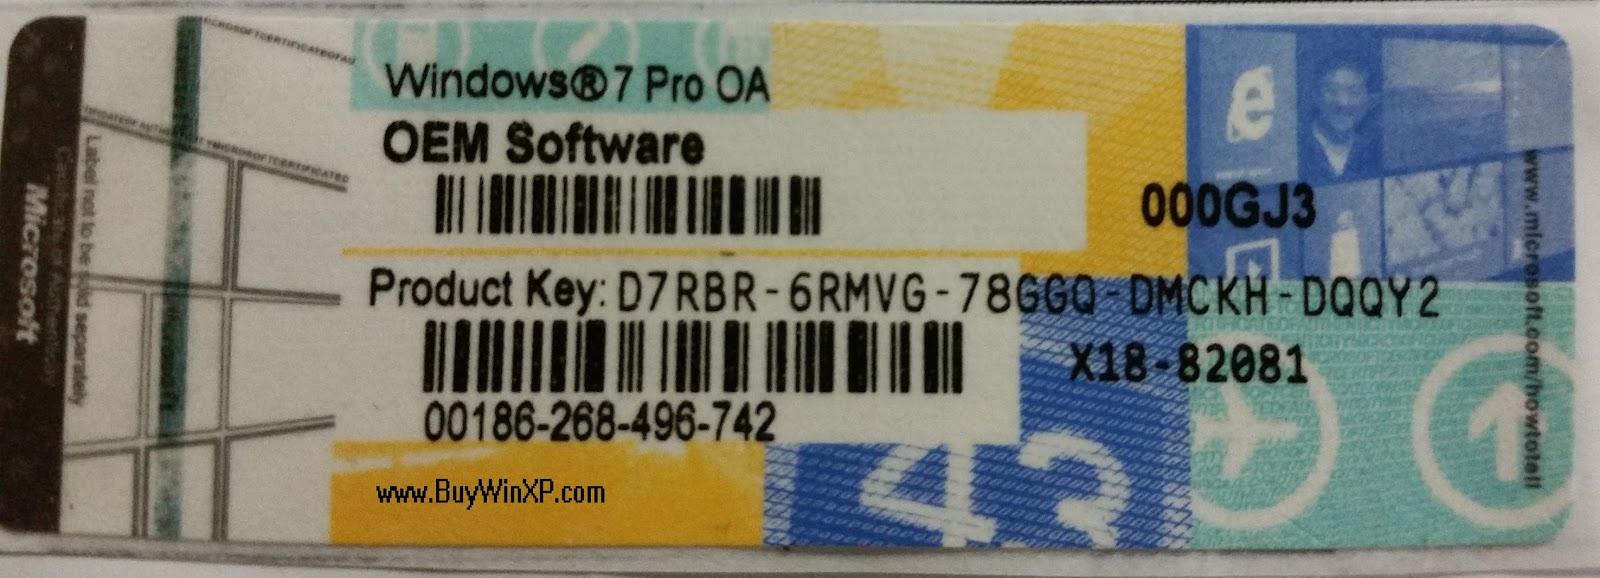 Windows 7 64 bit keys | Crack Best